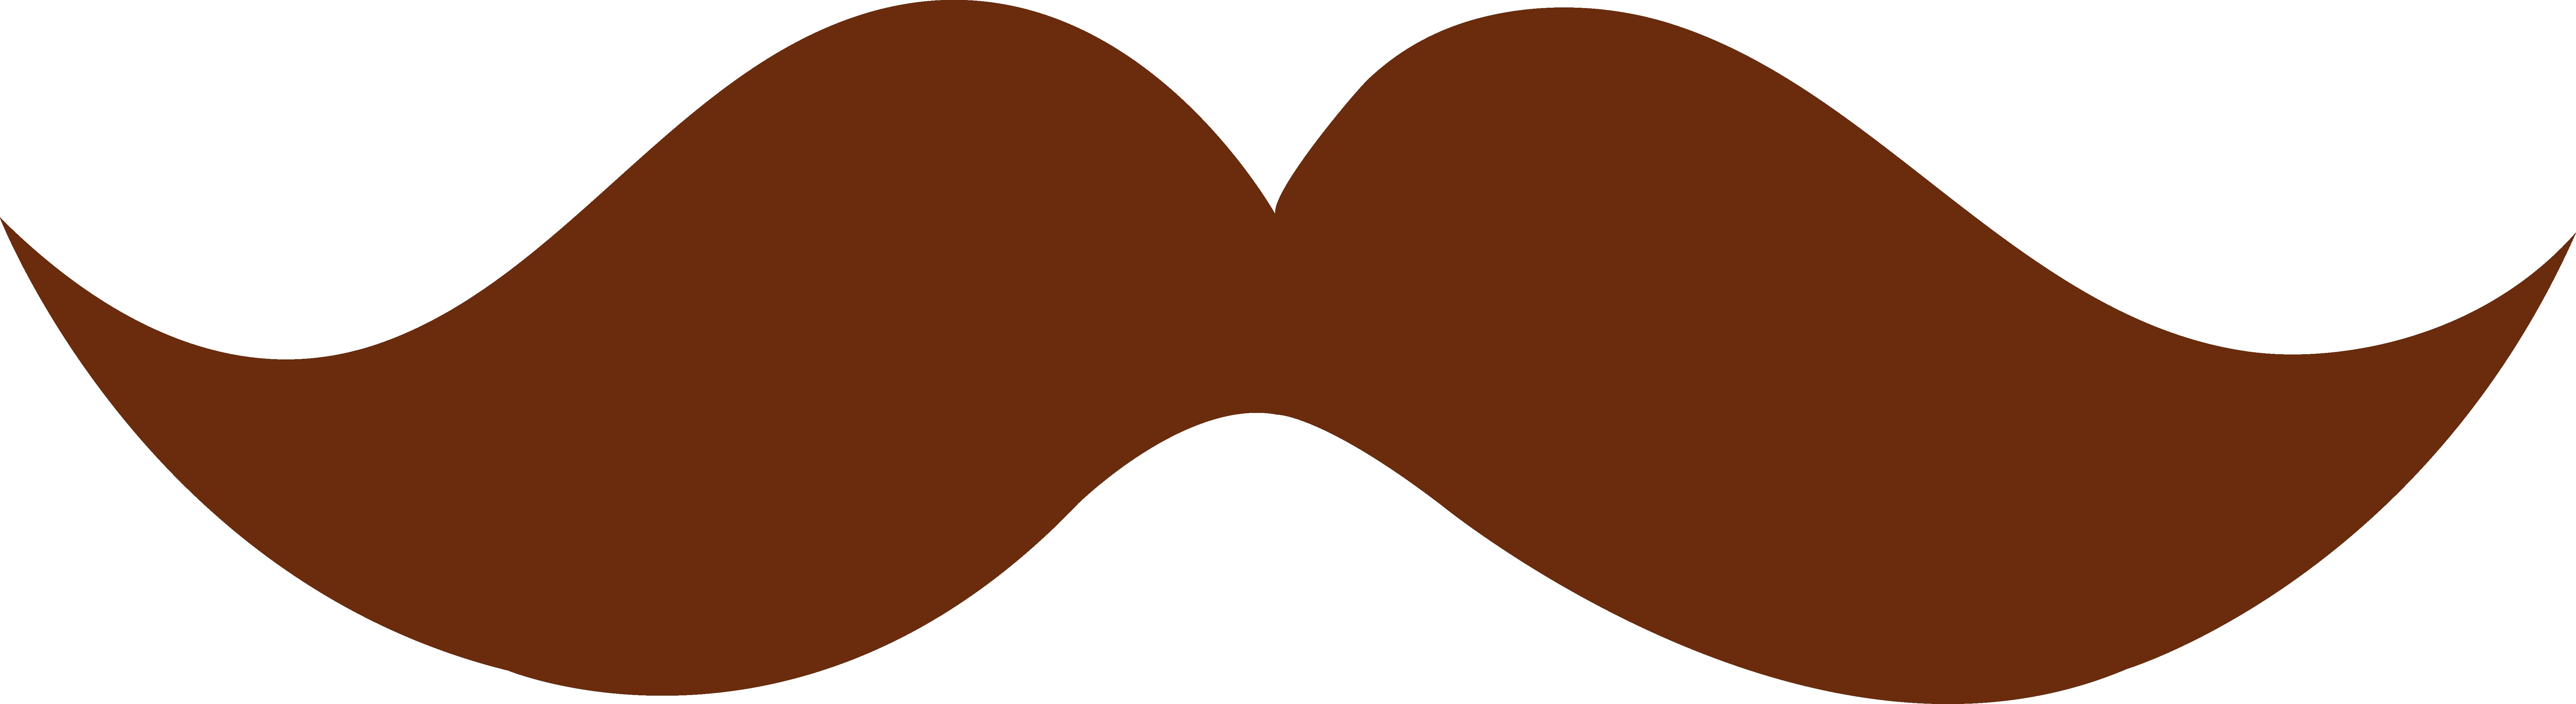 Brown Hair Clipart U0026middot; Moustach-brown hair clipart u0026middot; moustache clipart-7